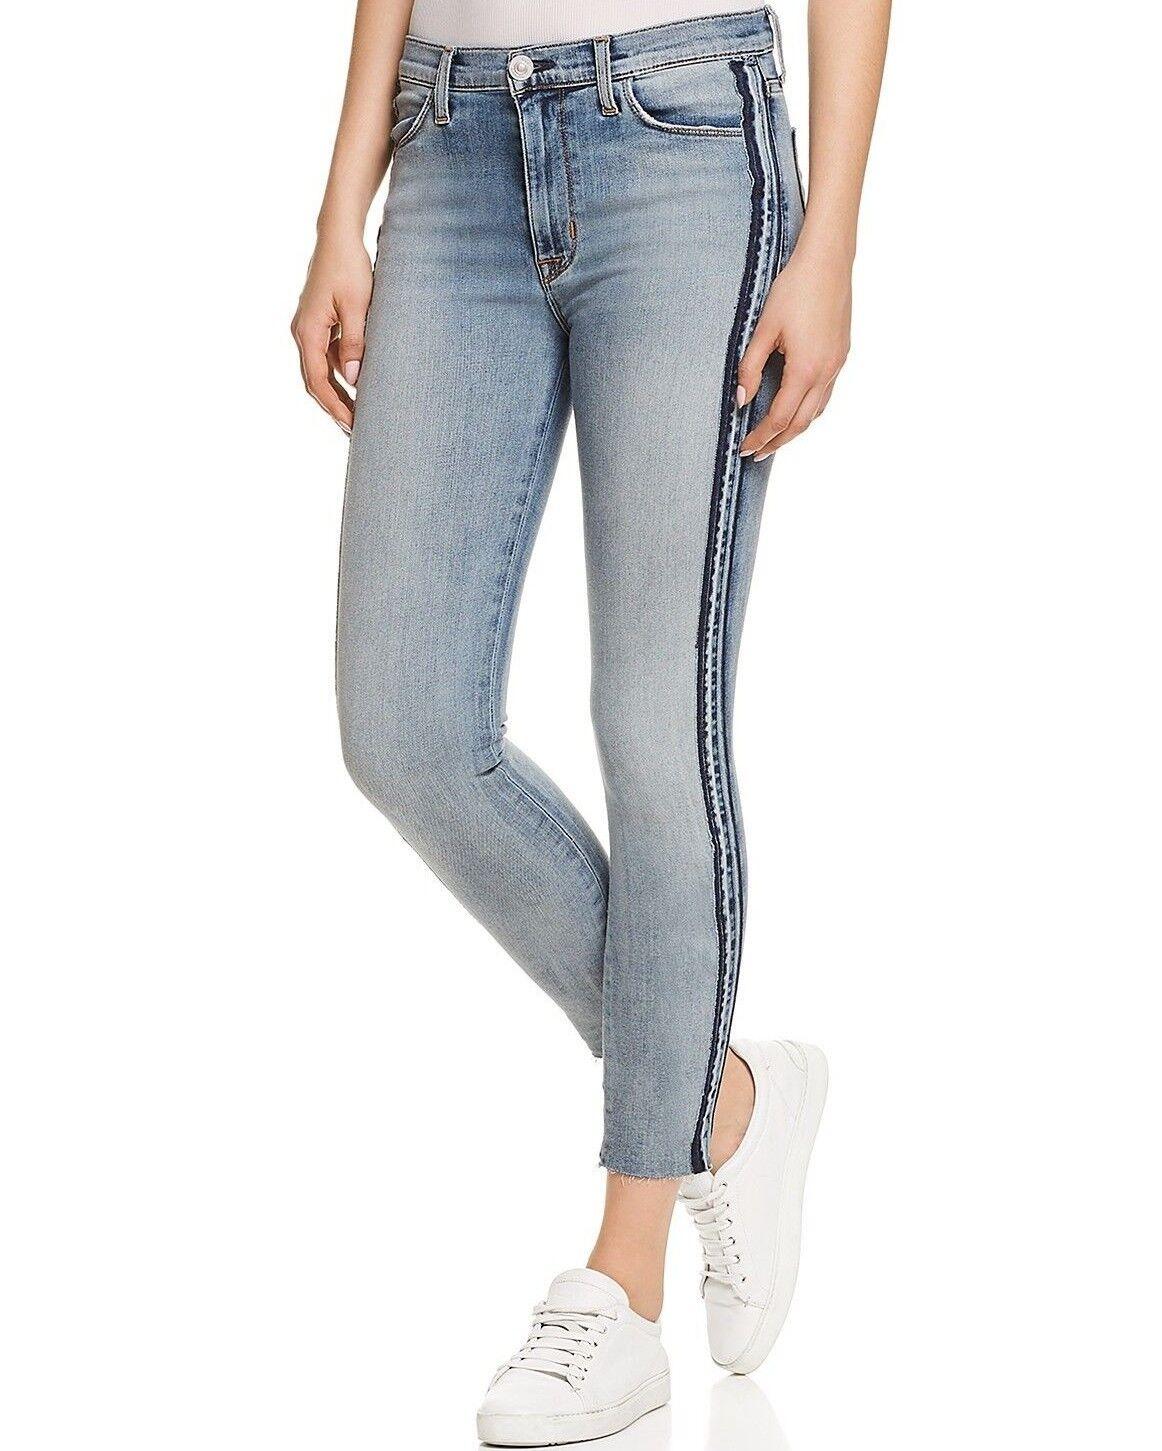 Nwt Hudson Sz27 Custom Barbara Hoher Skinny-Stretch Knöchel Jeans